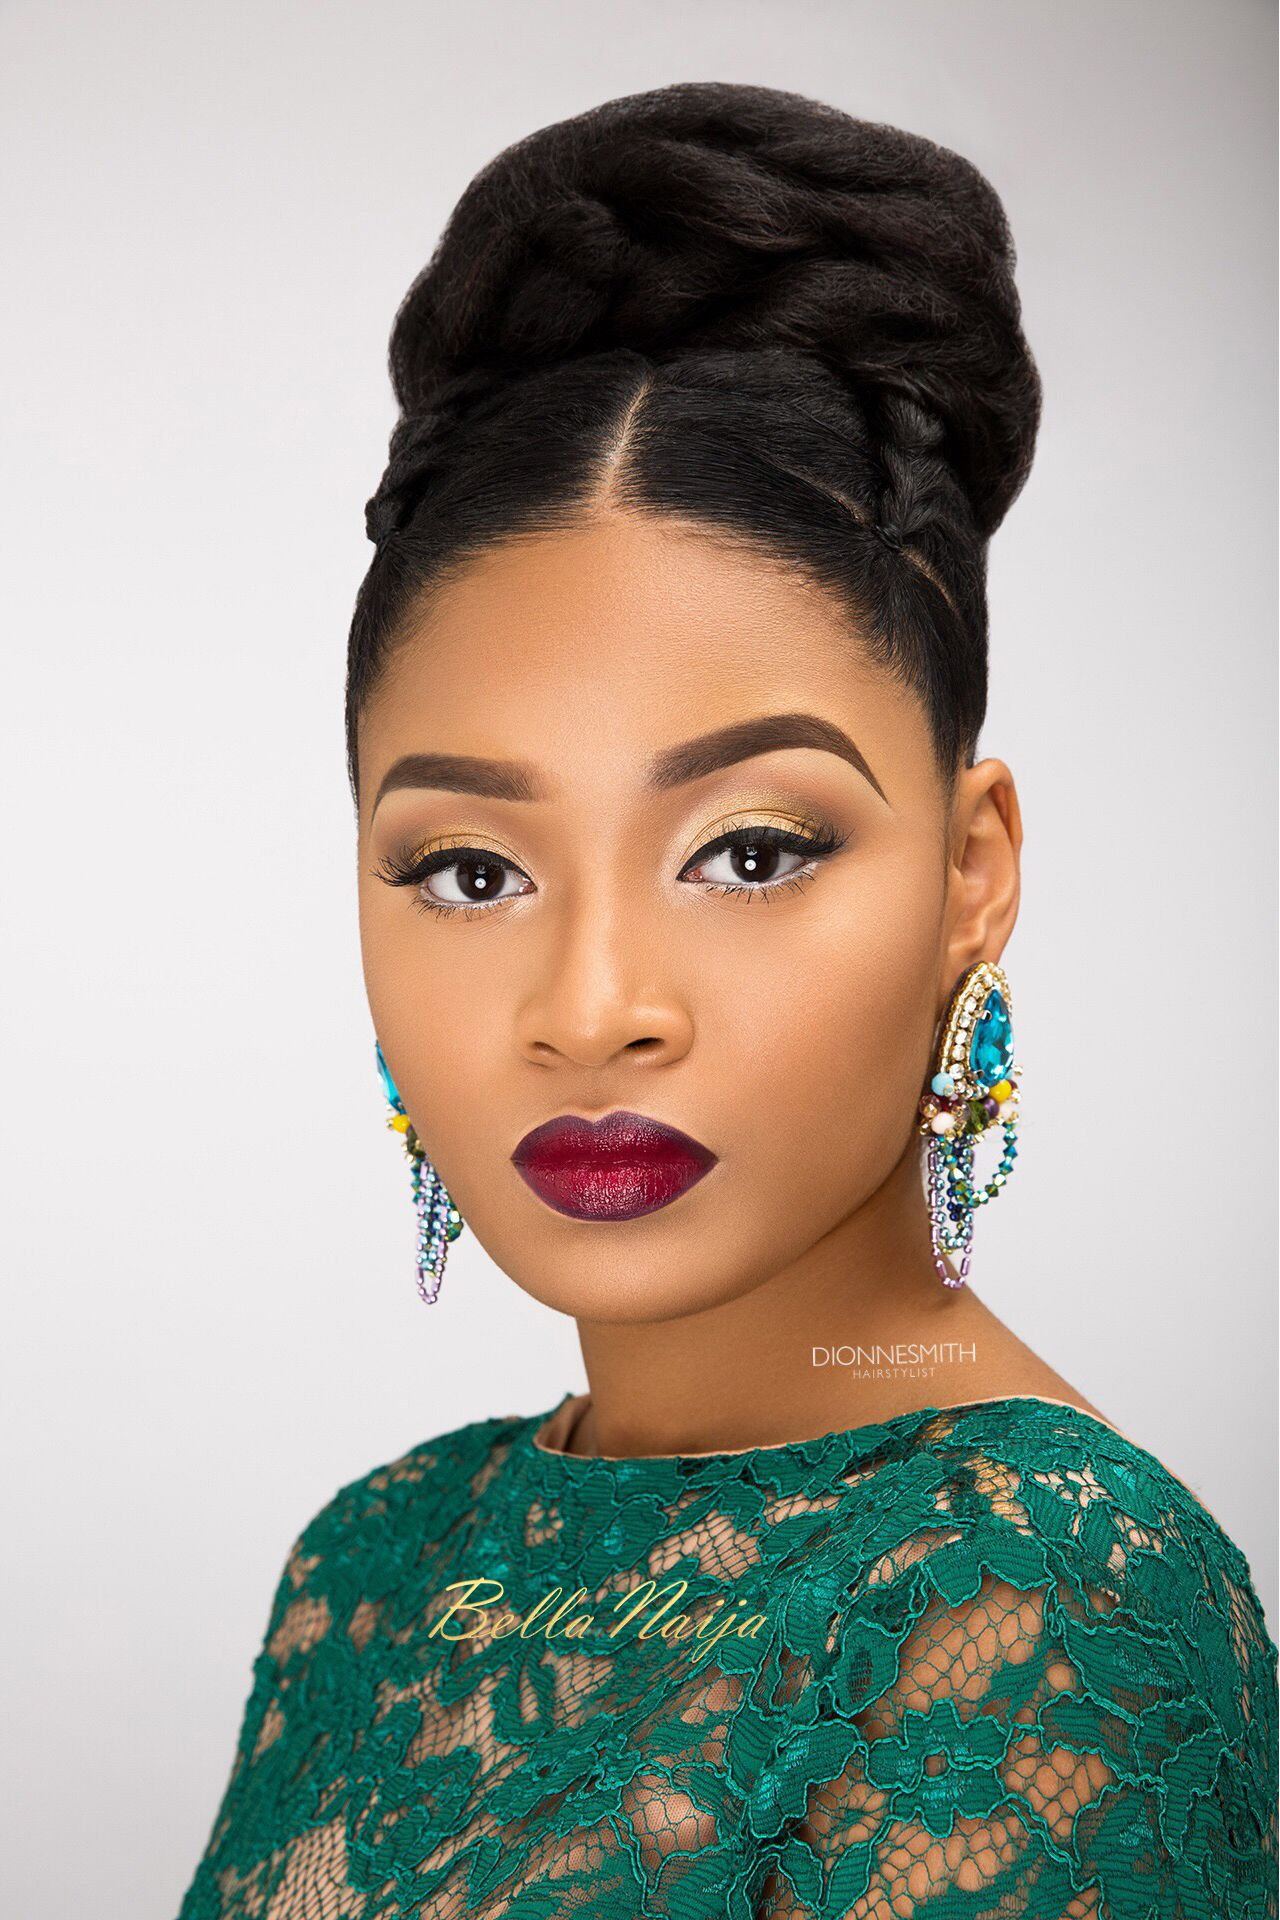 Afro Hairstyles hairstyleforblackwomen.net 44